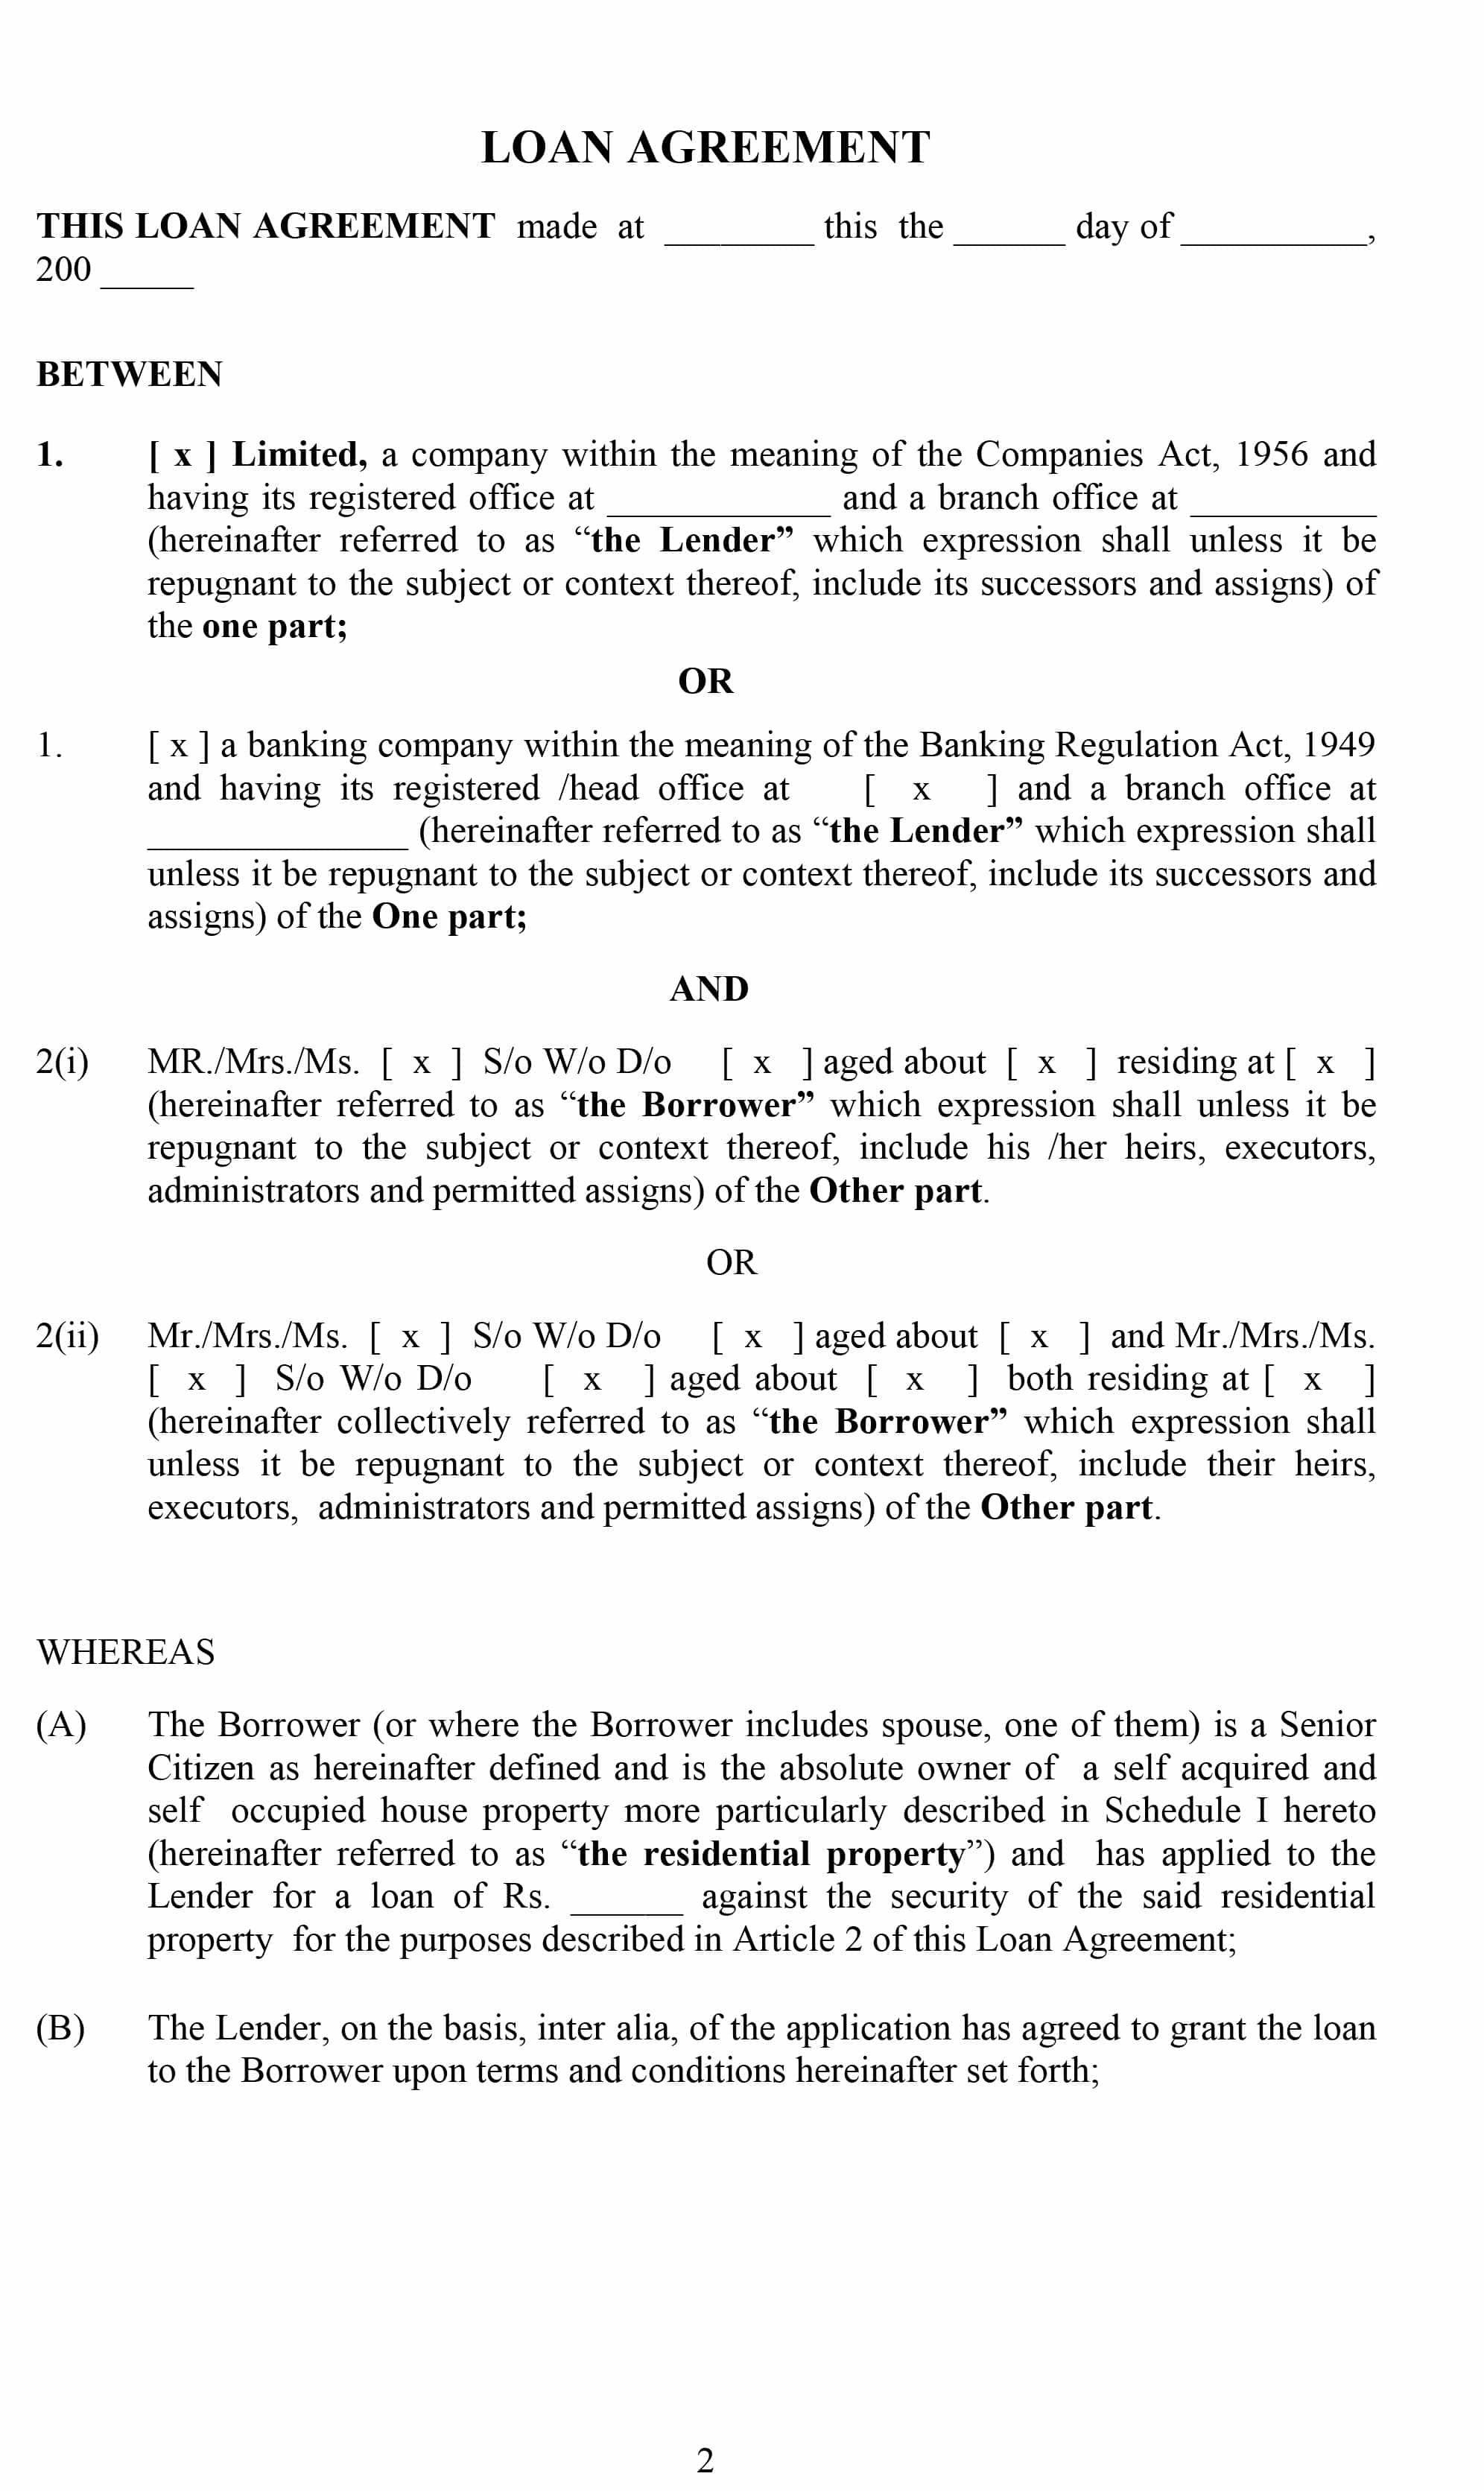 Free Loan Agreement Templates Word  Pdf ᐅ Template Lab In Heads Of Terms Agreement Template